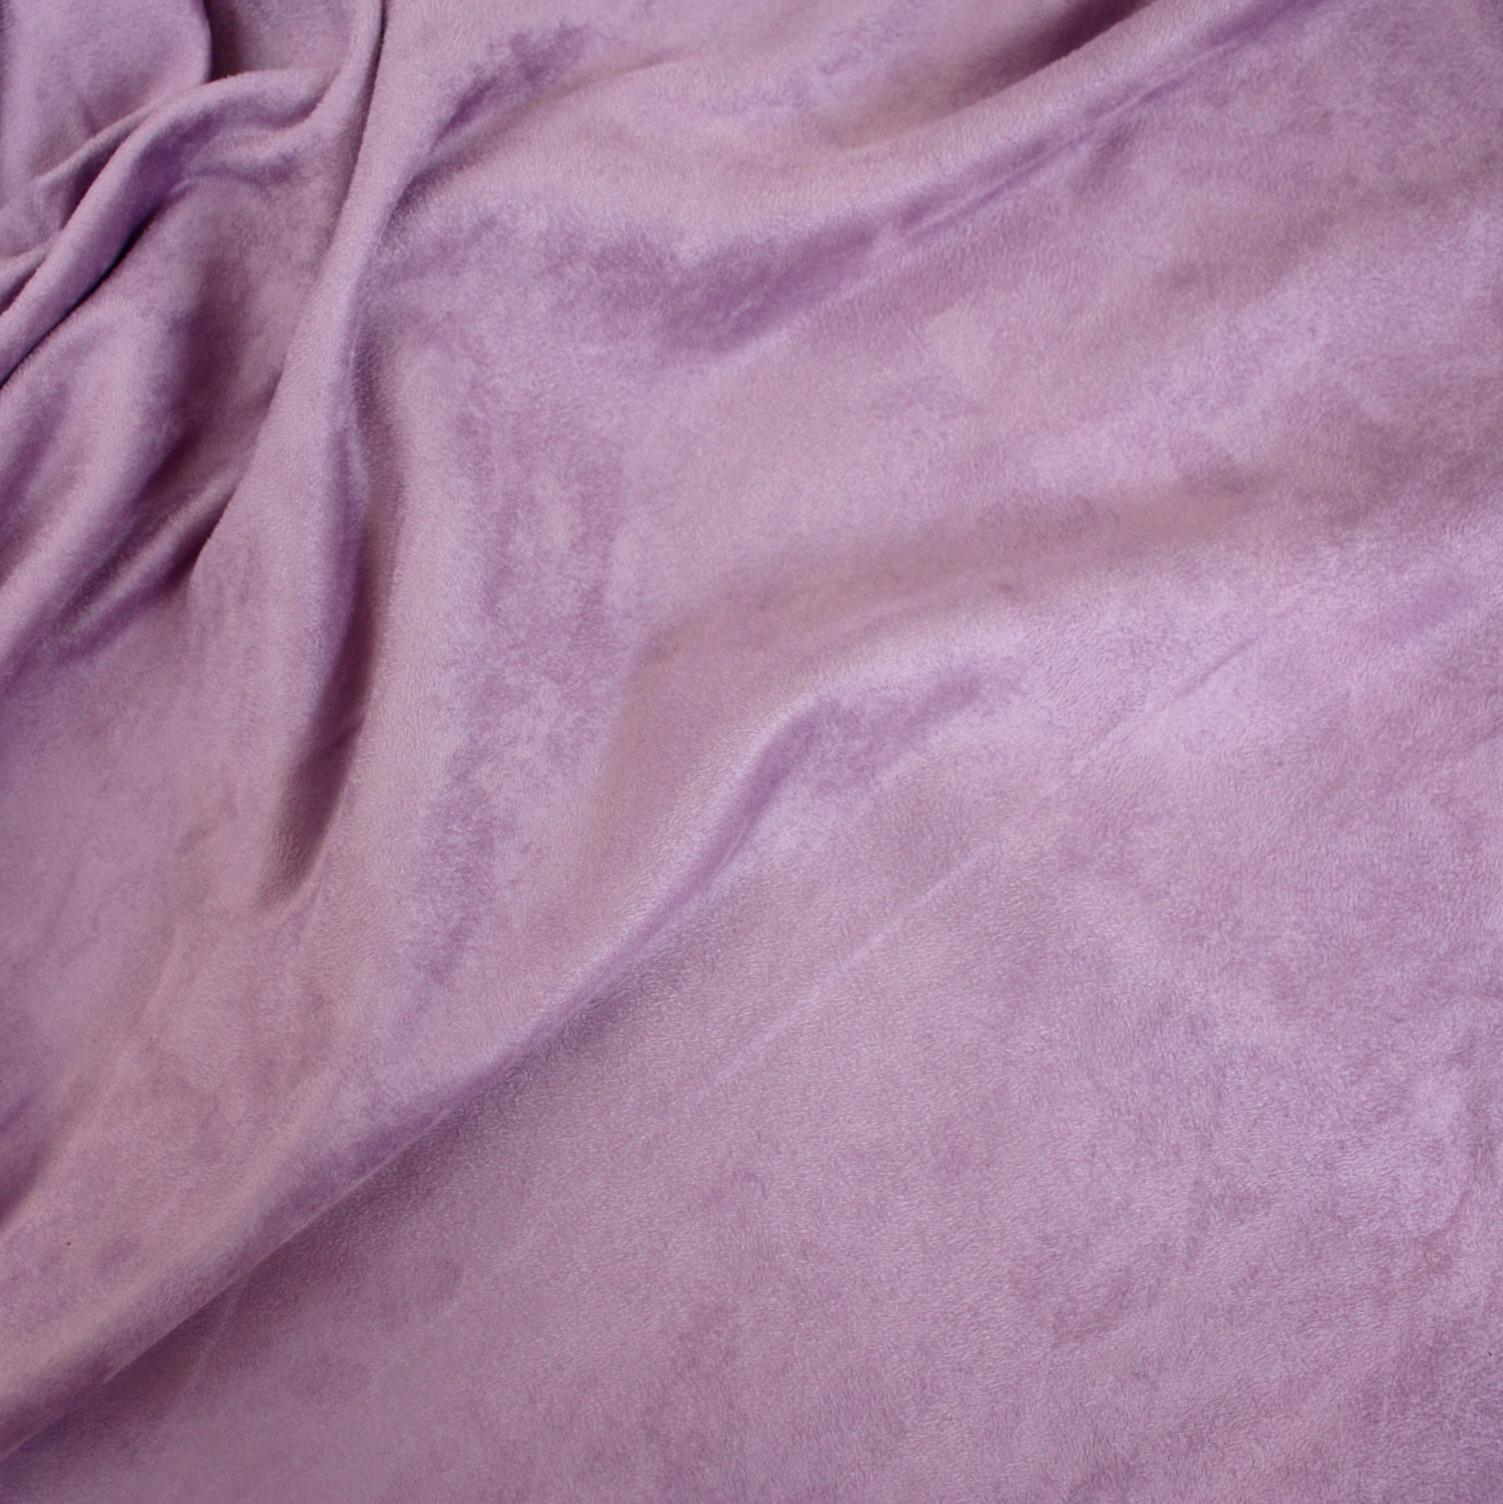 LilacSuede